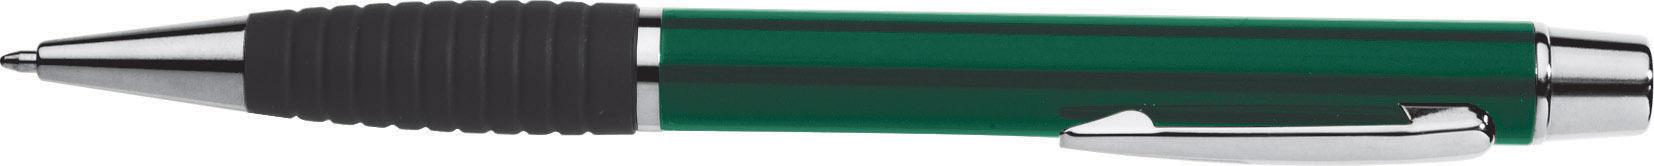 Ручка подар. EK Avantage VN-230 поворотная, зелен. корпус с резинк